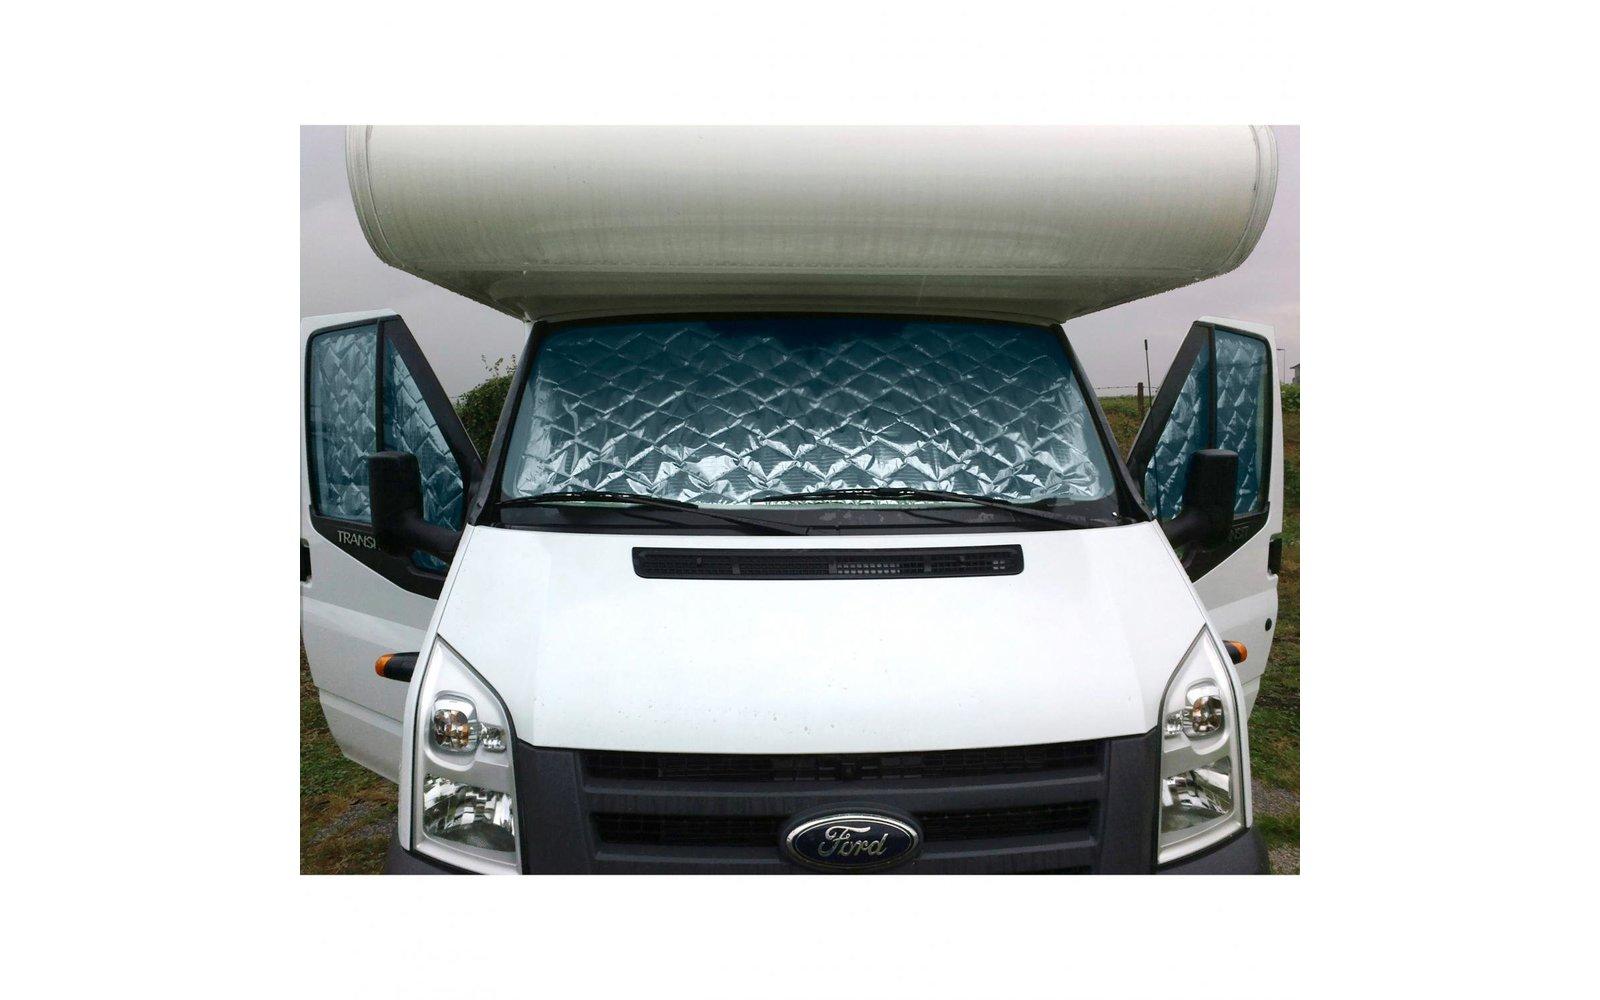 thermomatten set renault fritz berger campingbedarf. Black Bedroom Furniture Sets. Home Design Ideas